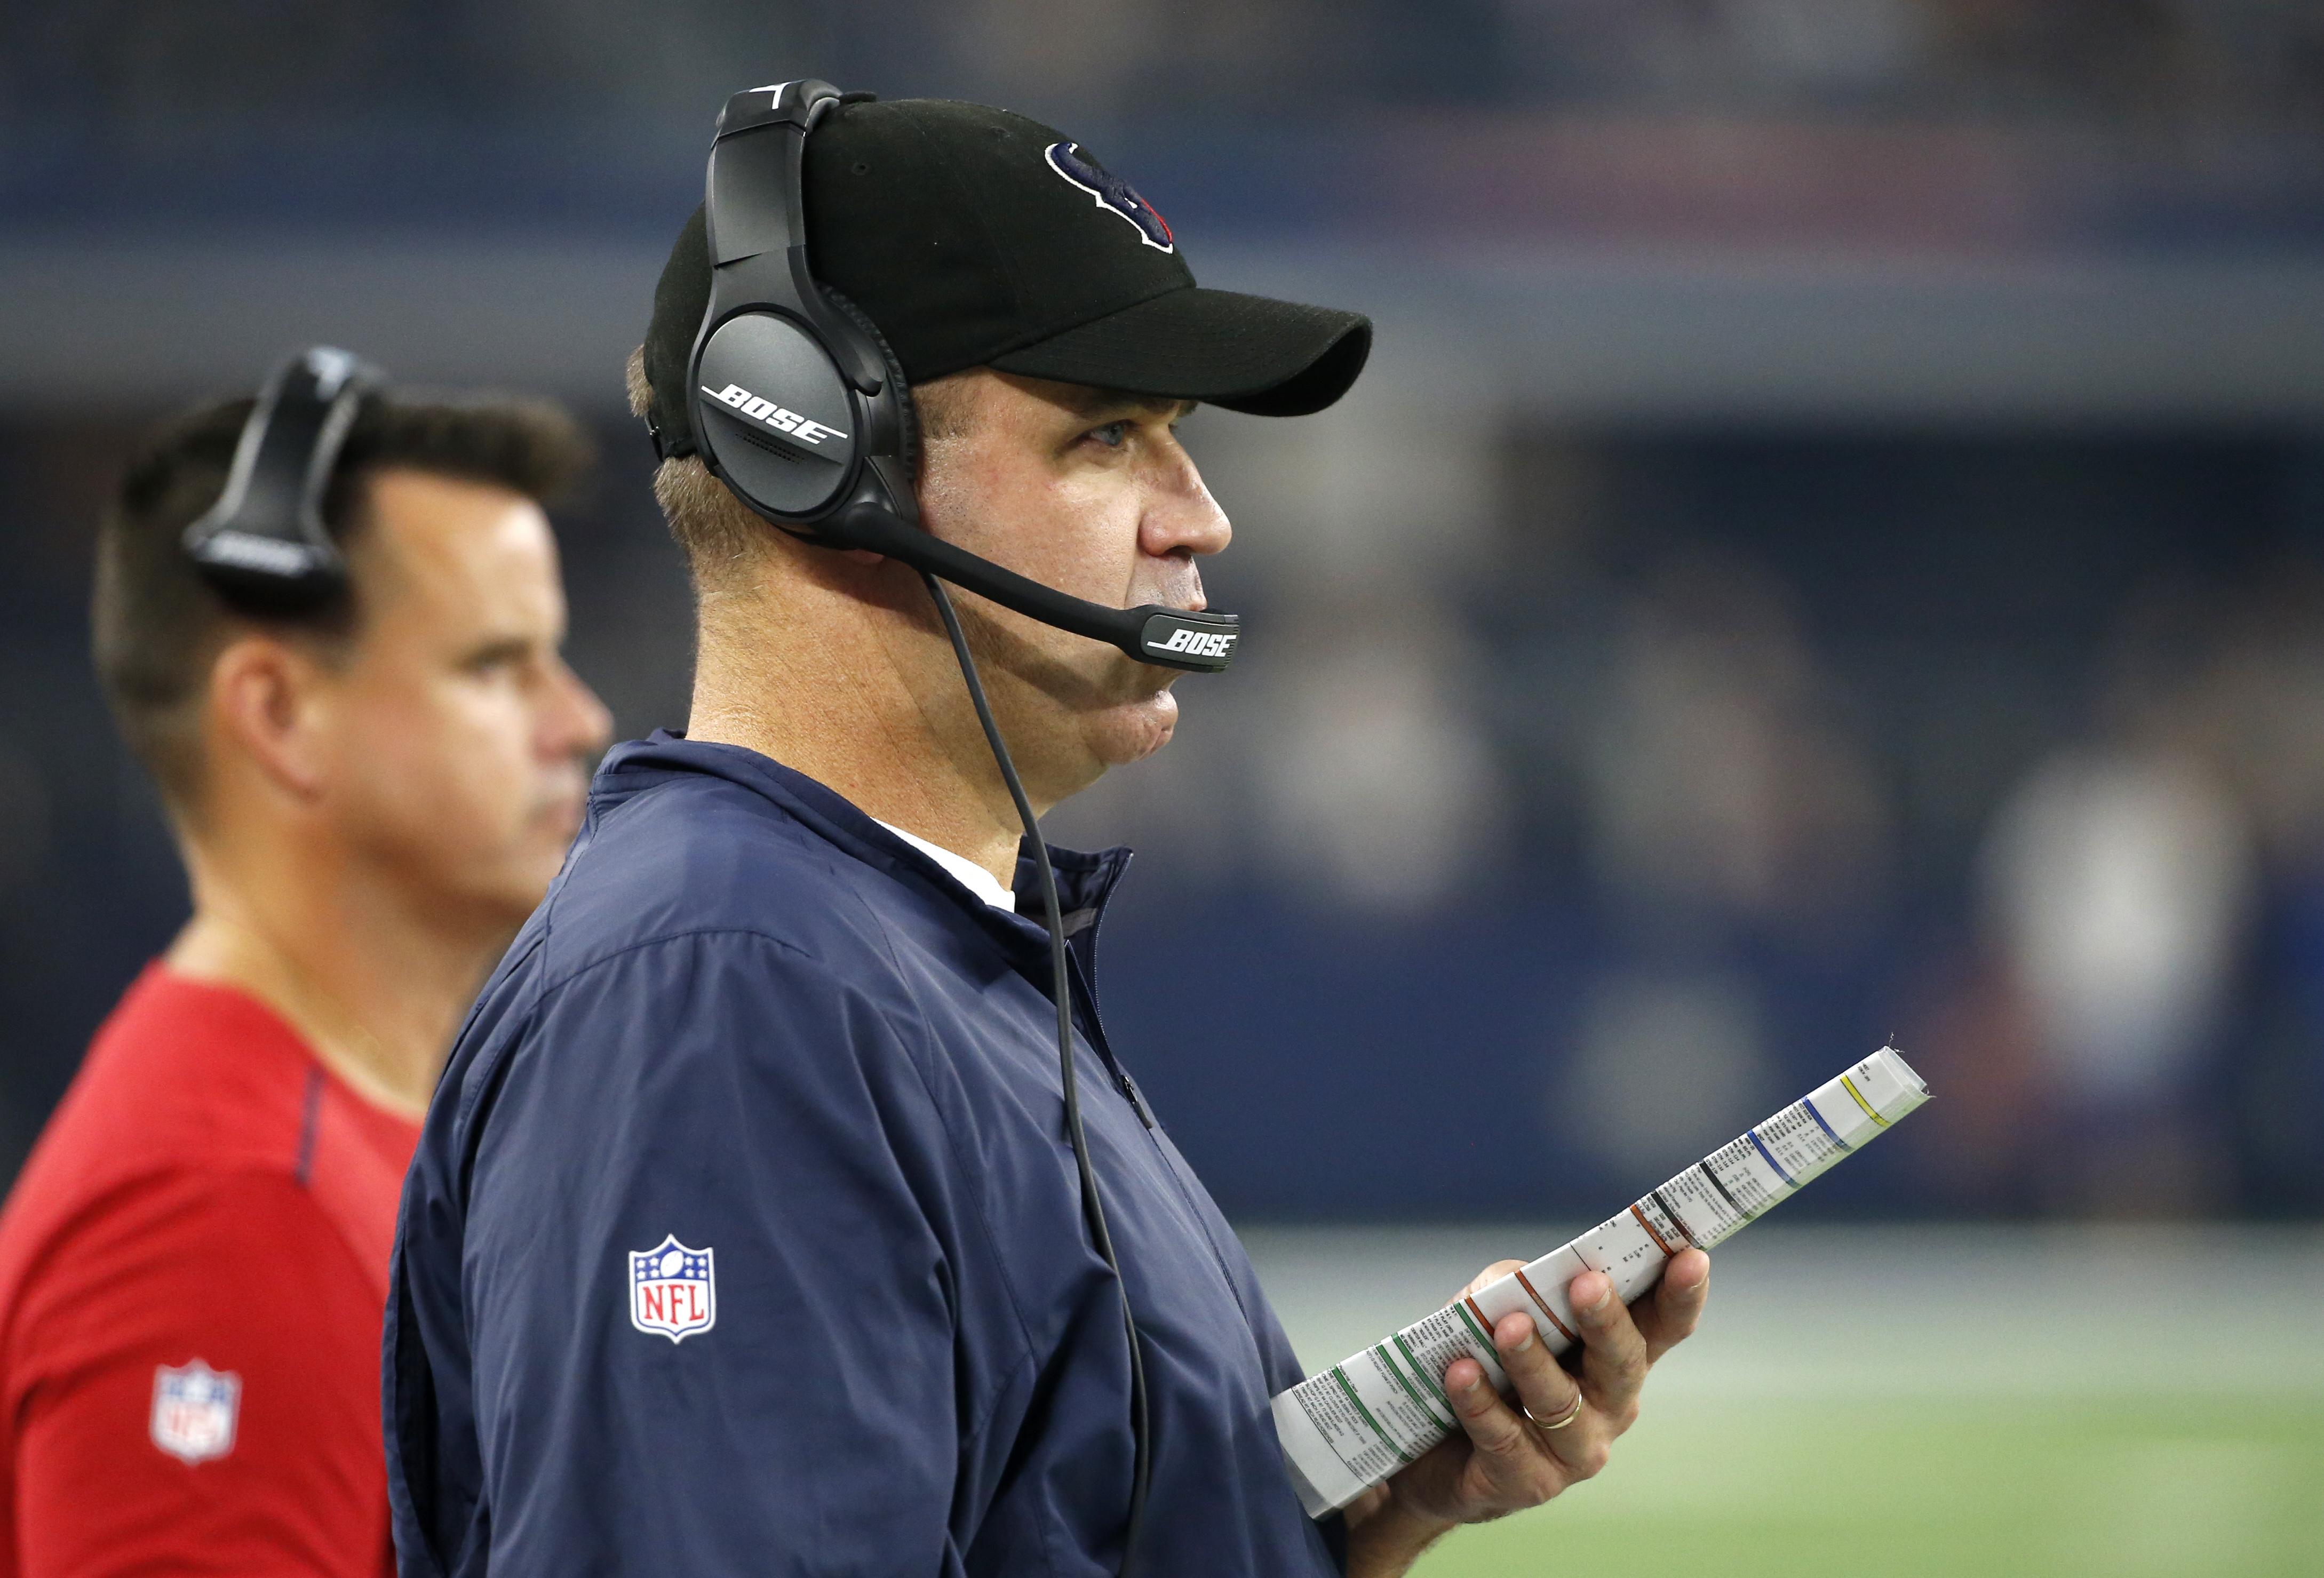 Houston Texans head coach Bill O'Brien watches play against the Dallas Cowboys in the first half of a preseason NFL football game, Thursday Sept. 1, 2016, in Arlington, Texas. (AP Photo/Michael Ainsworth)